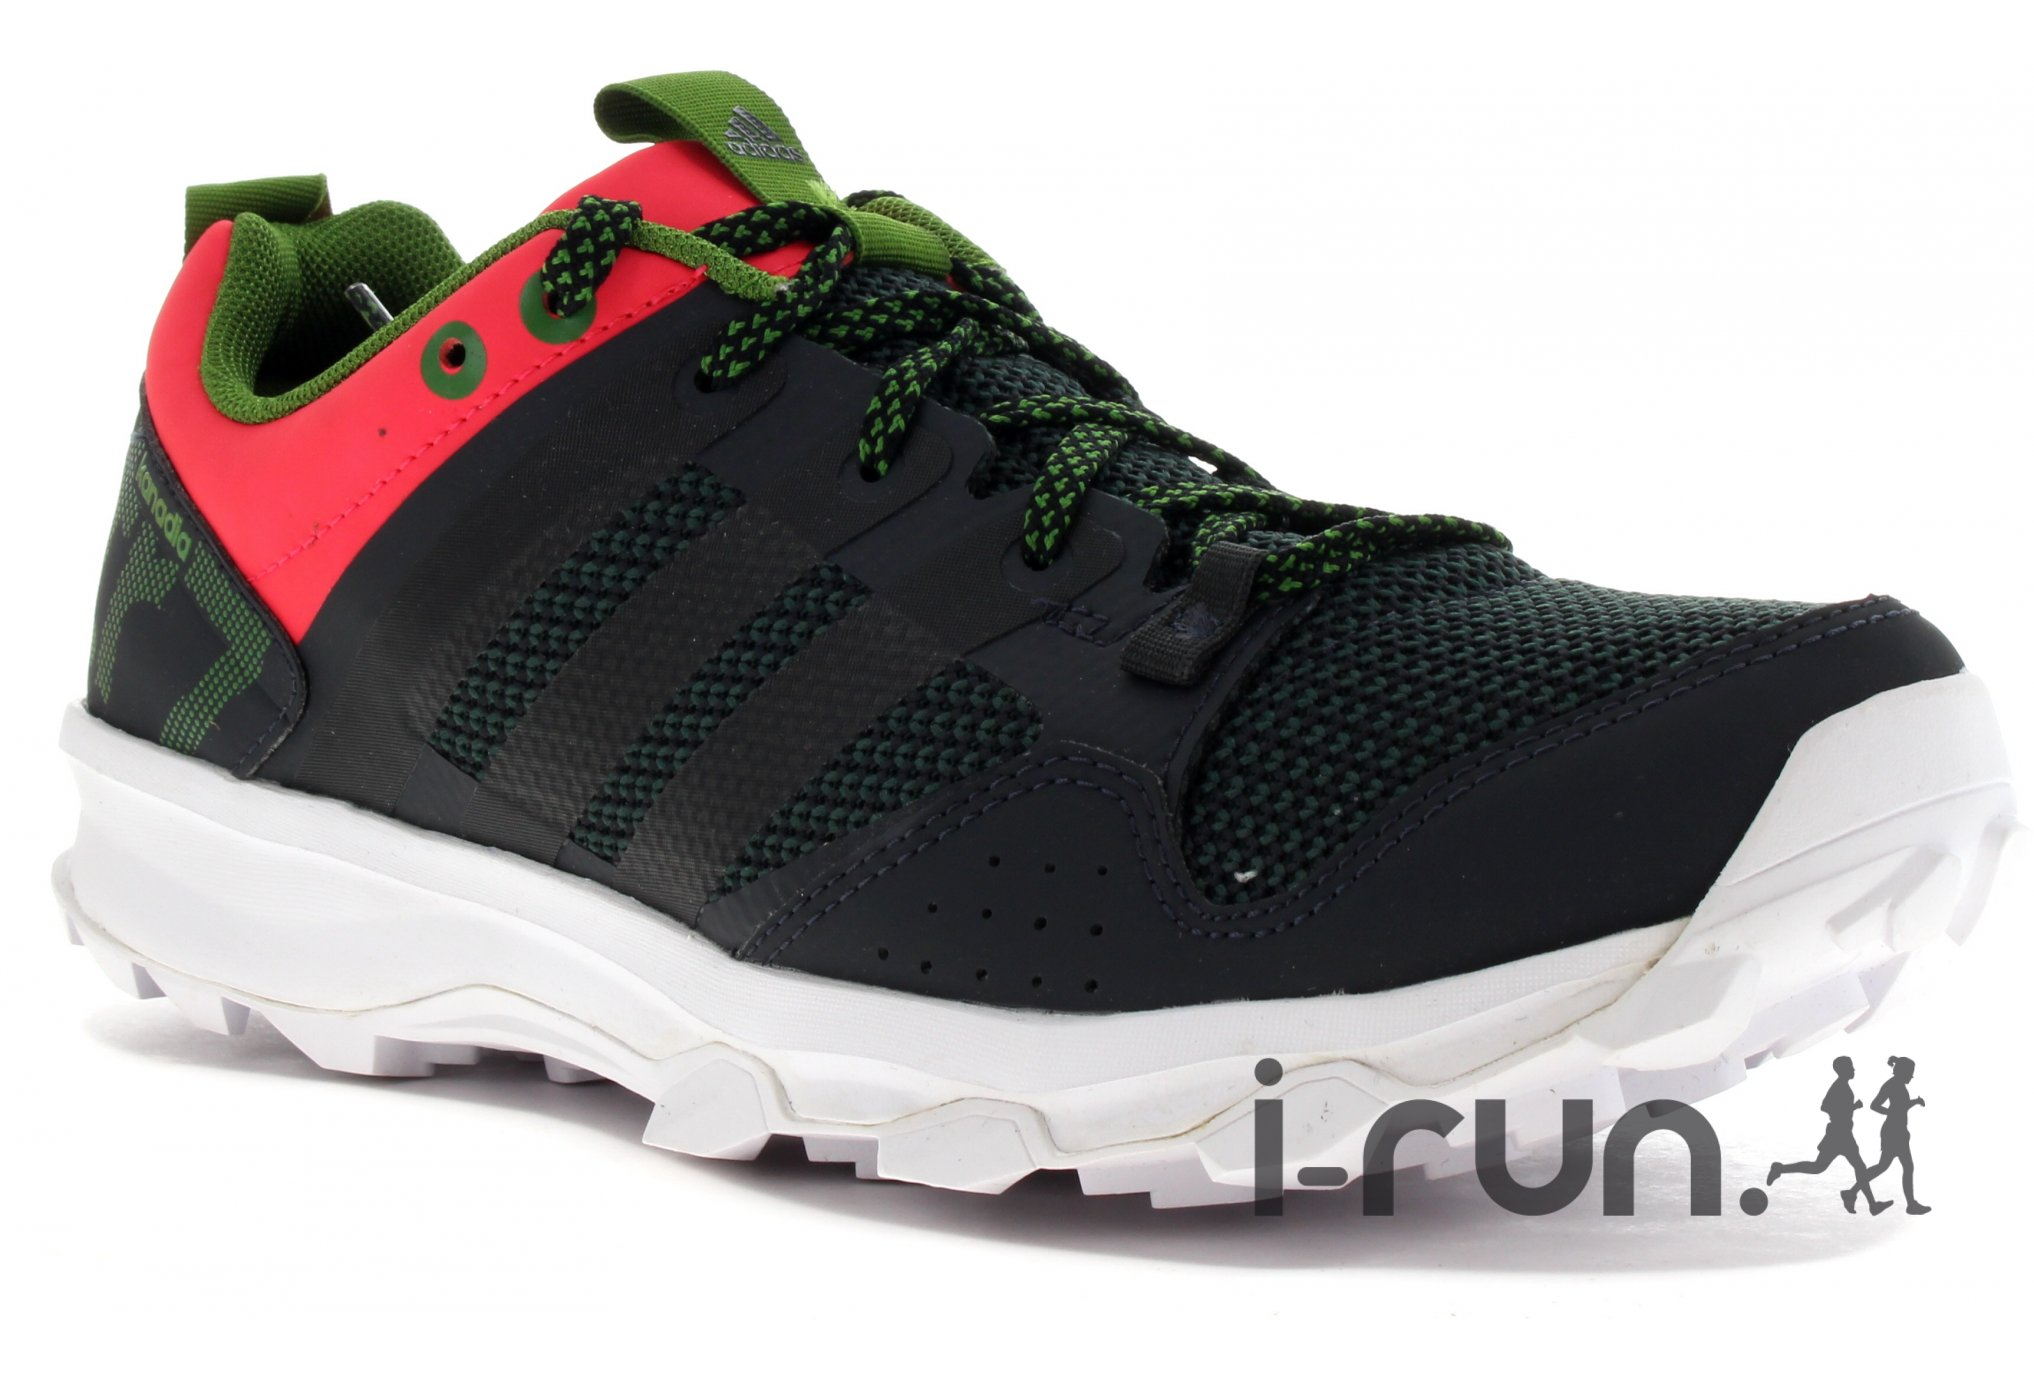 Adidas Kanadia 7 tr w chaussures running femme